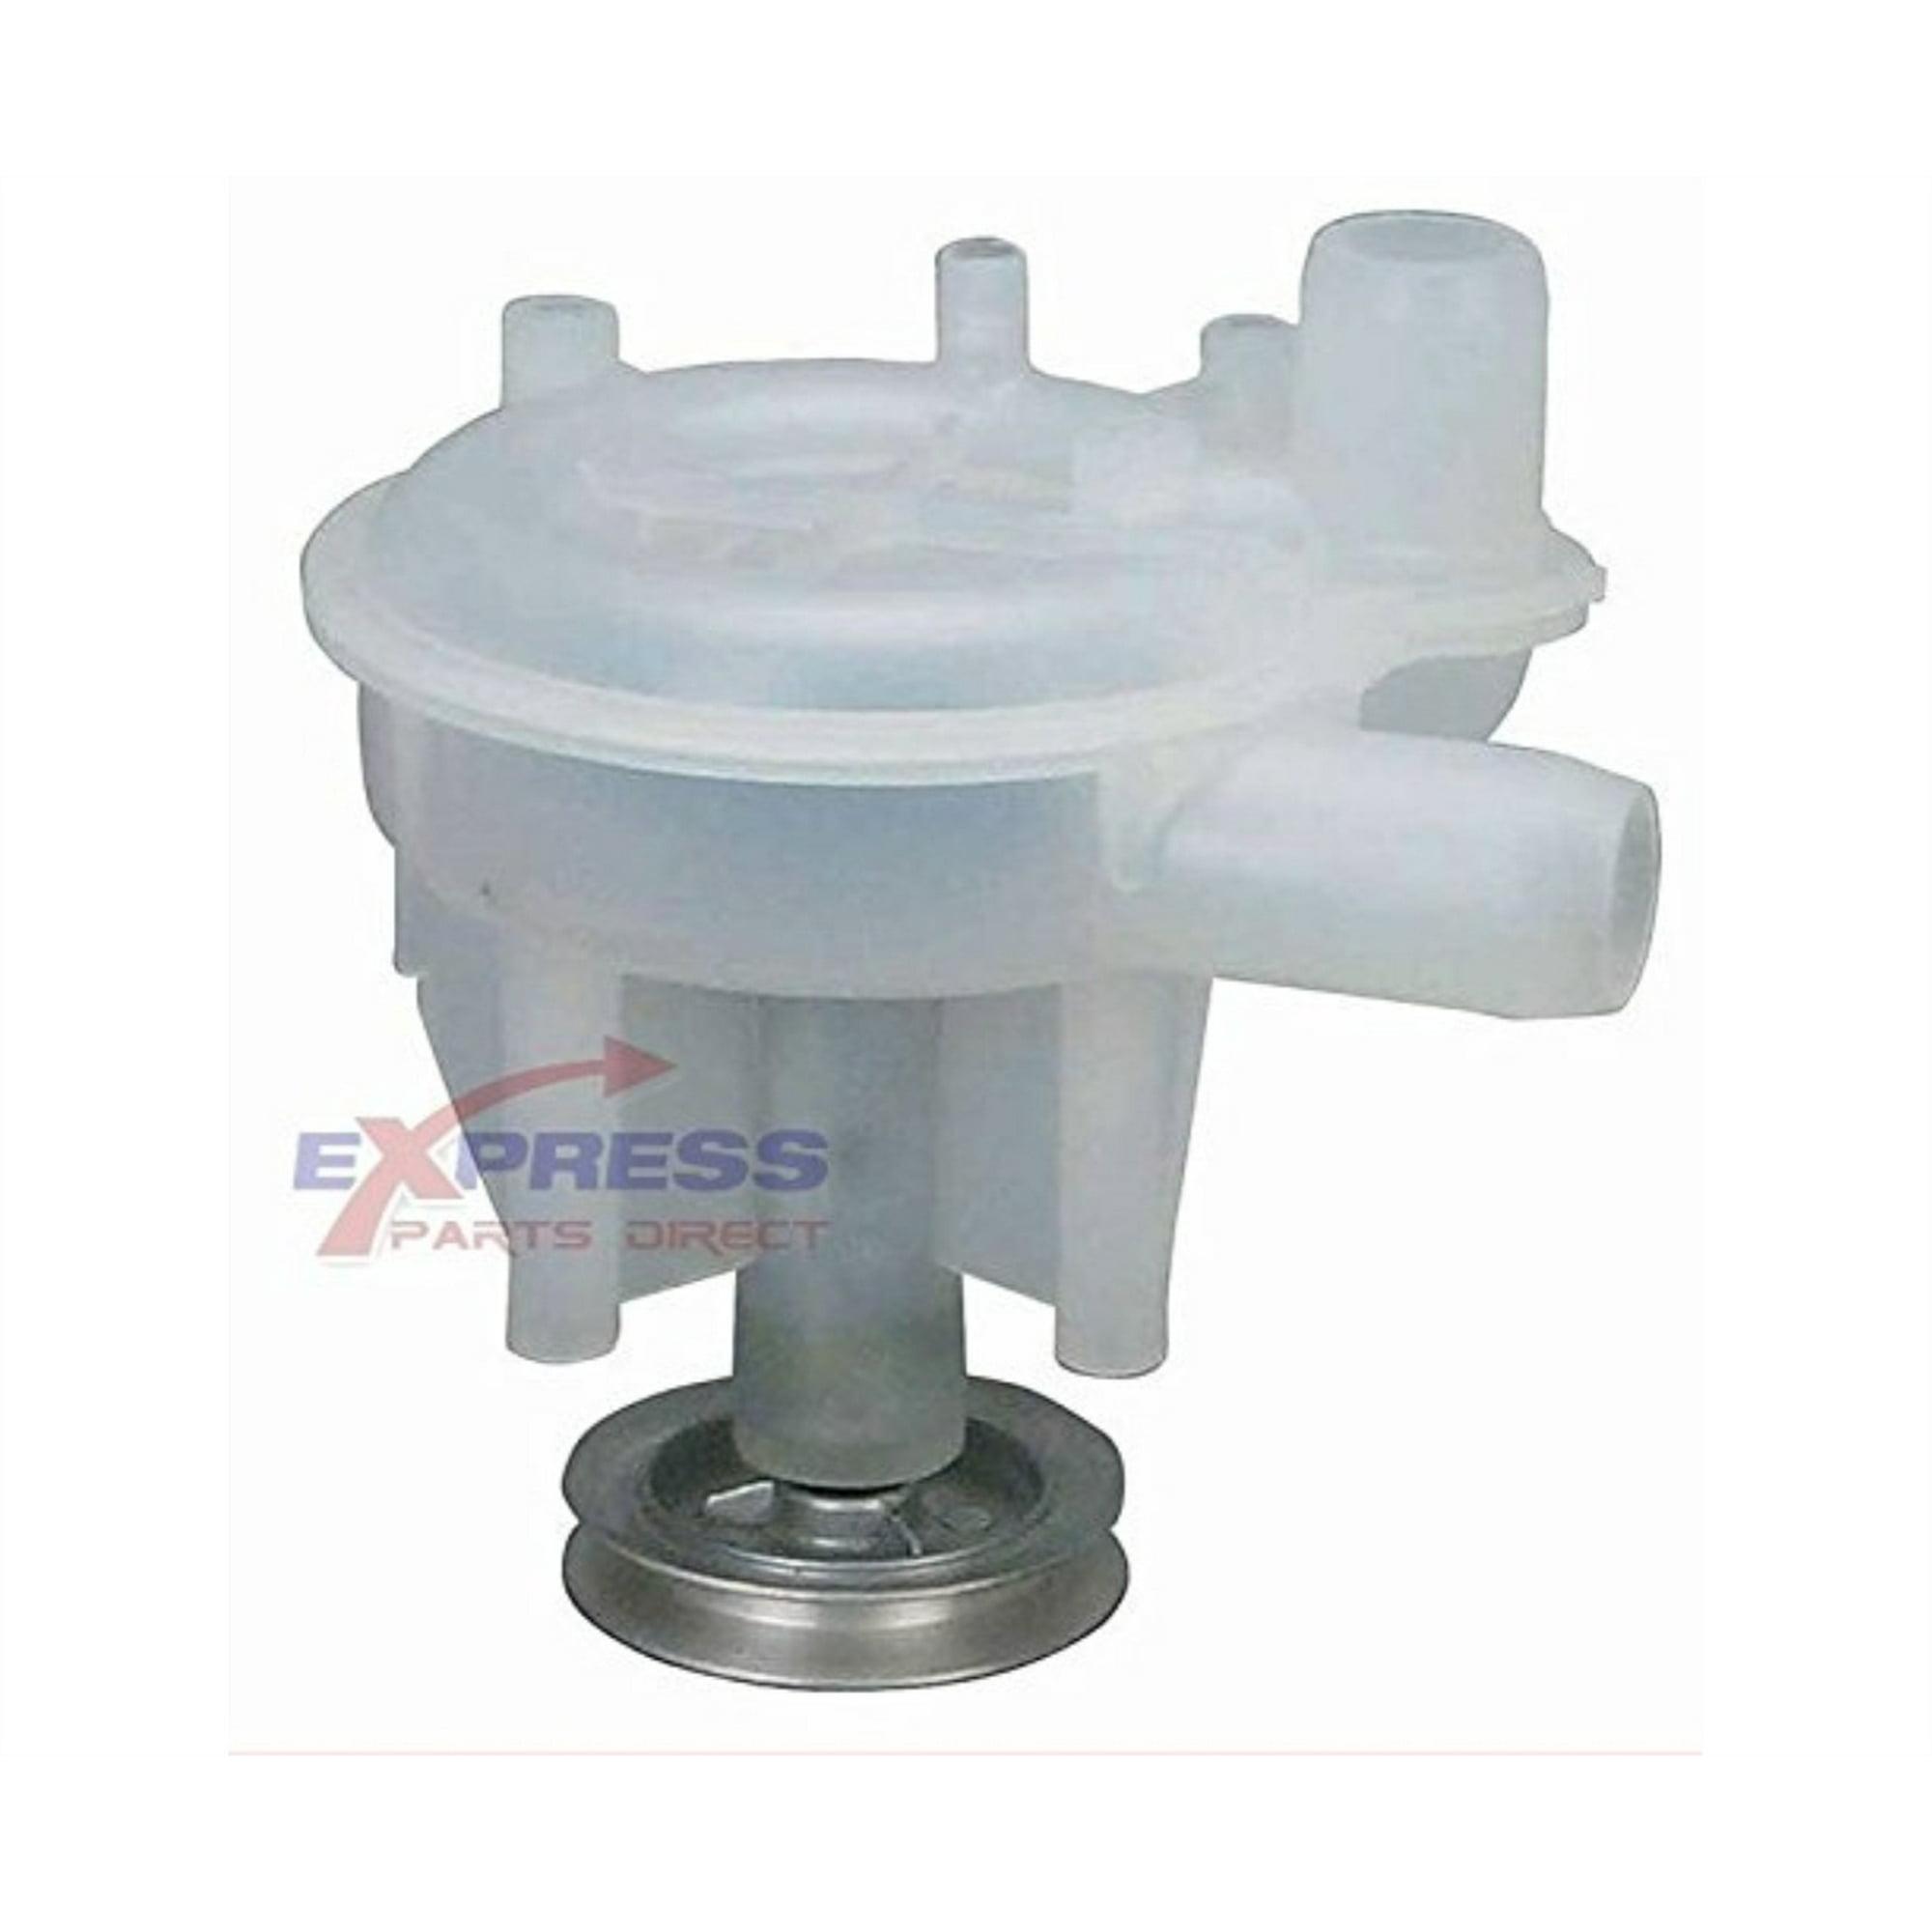 WP6-2022030 ( 202203 ) Washer Drain Pump for Maytag, Jenn